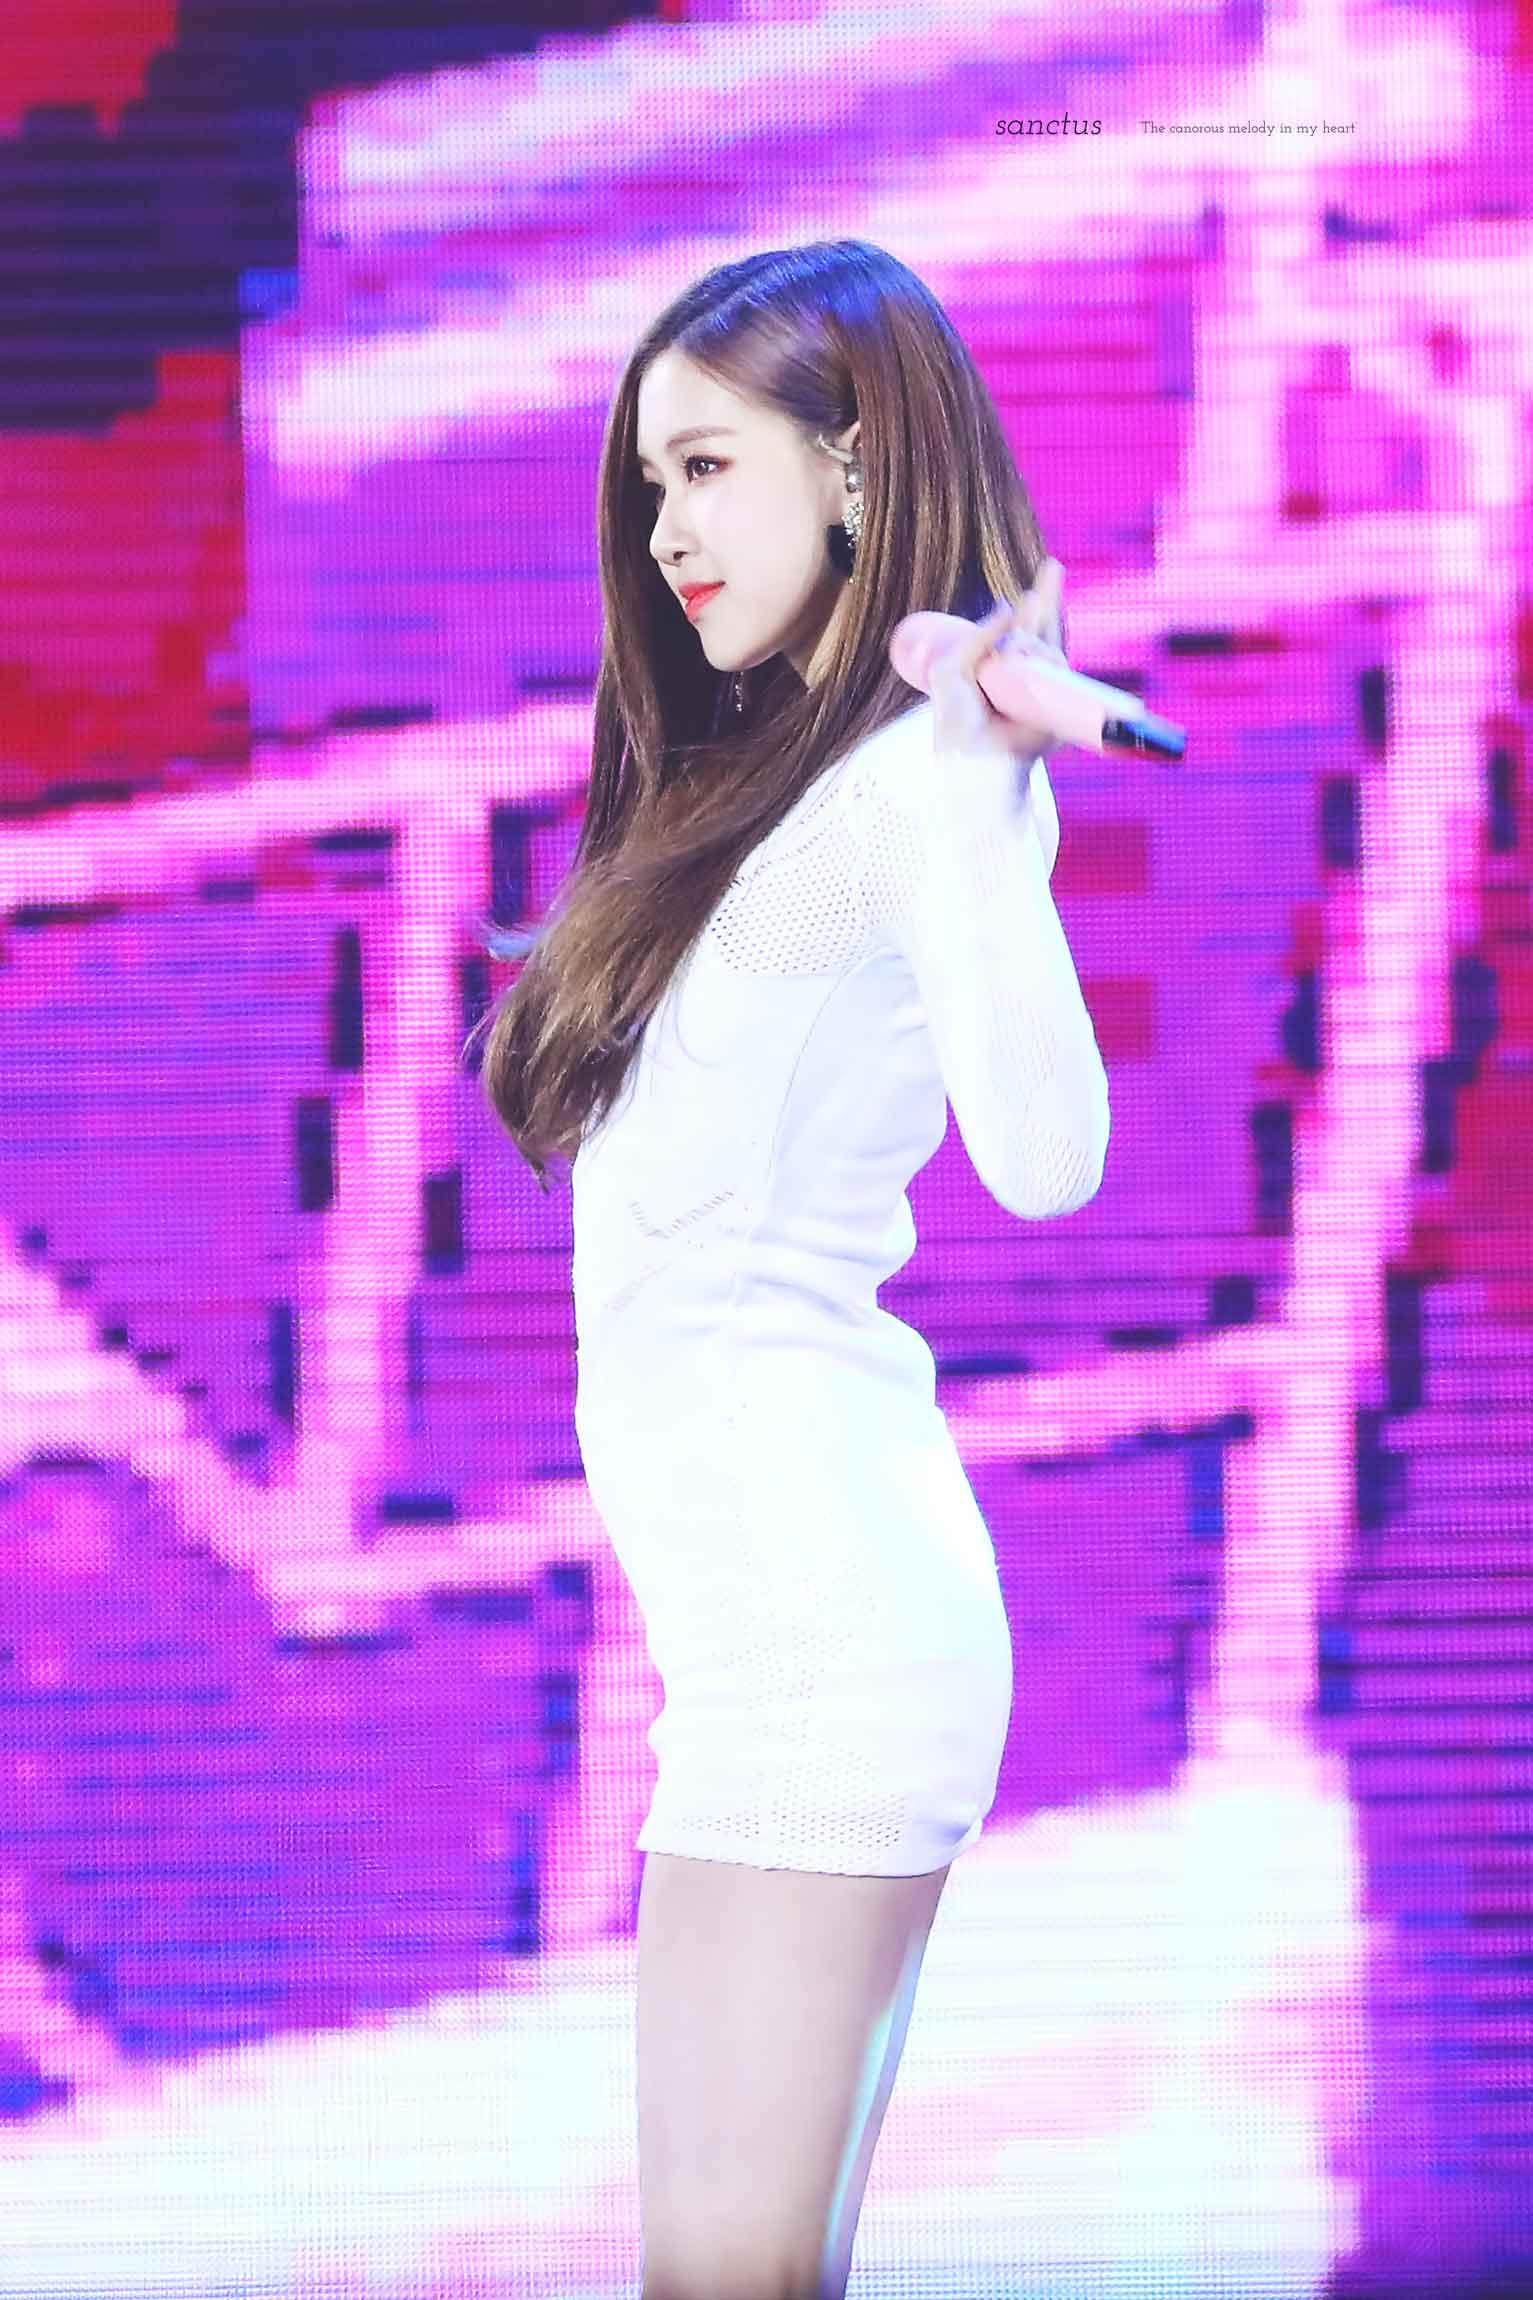 Blackpink Rose Seoul Music Awards 2018